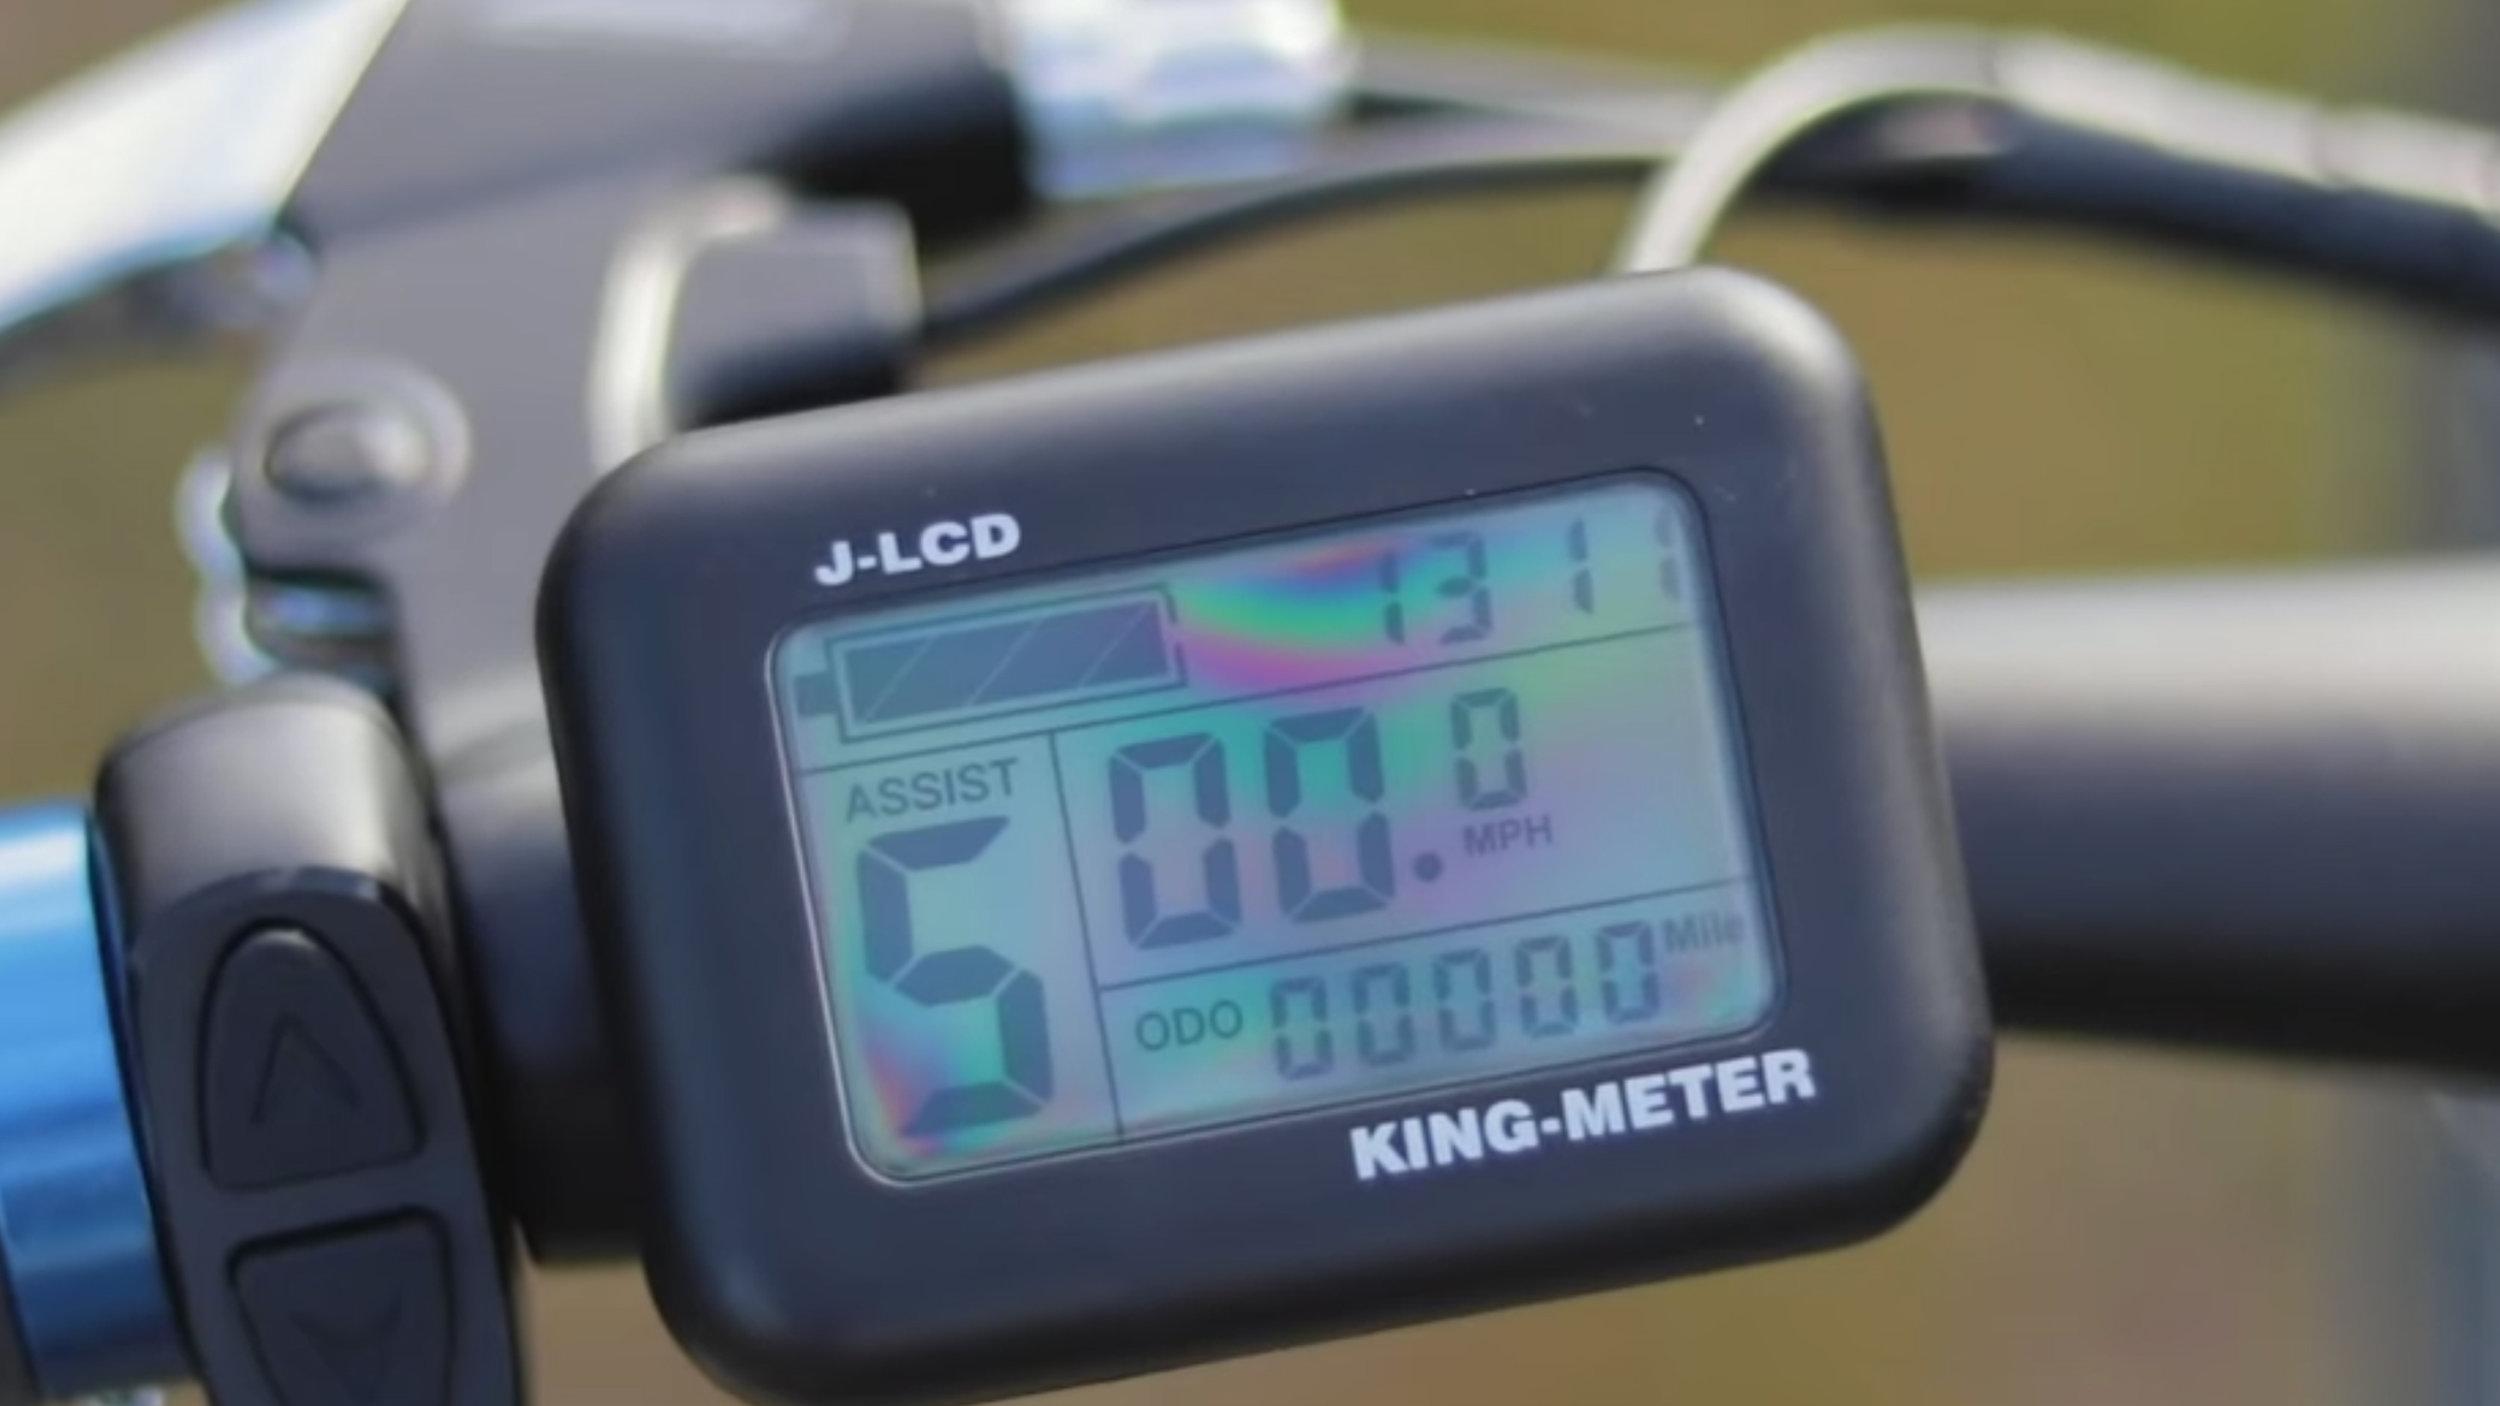 electrified-reviews-propella-2-single-speed-electric-bike-review-king-meter-display.jpg